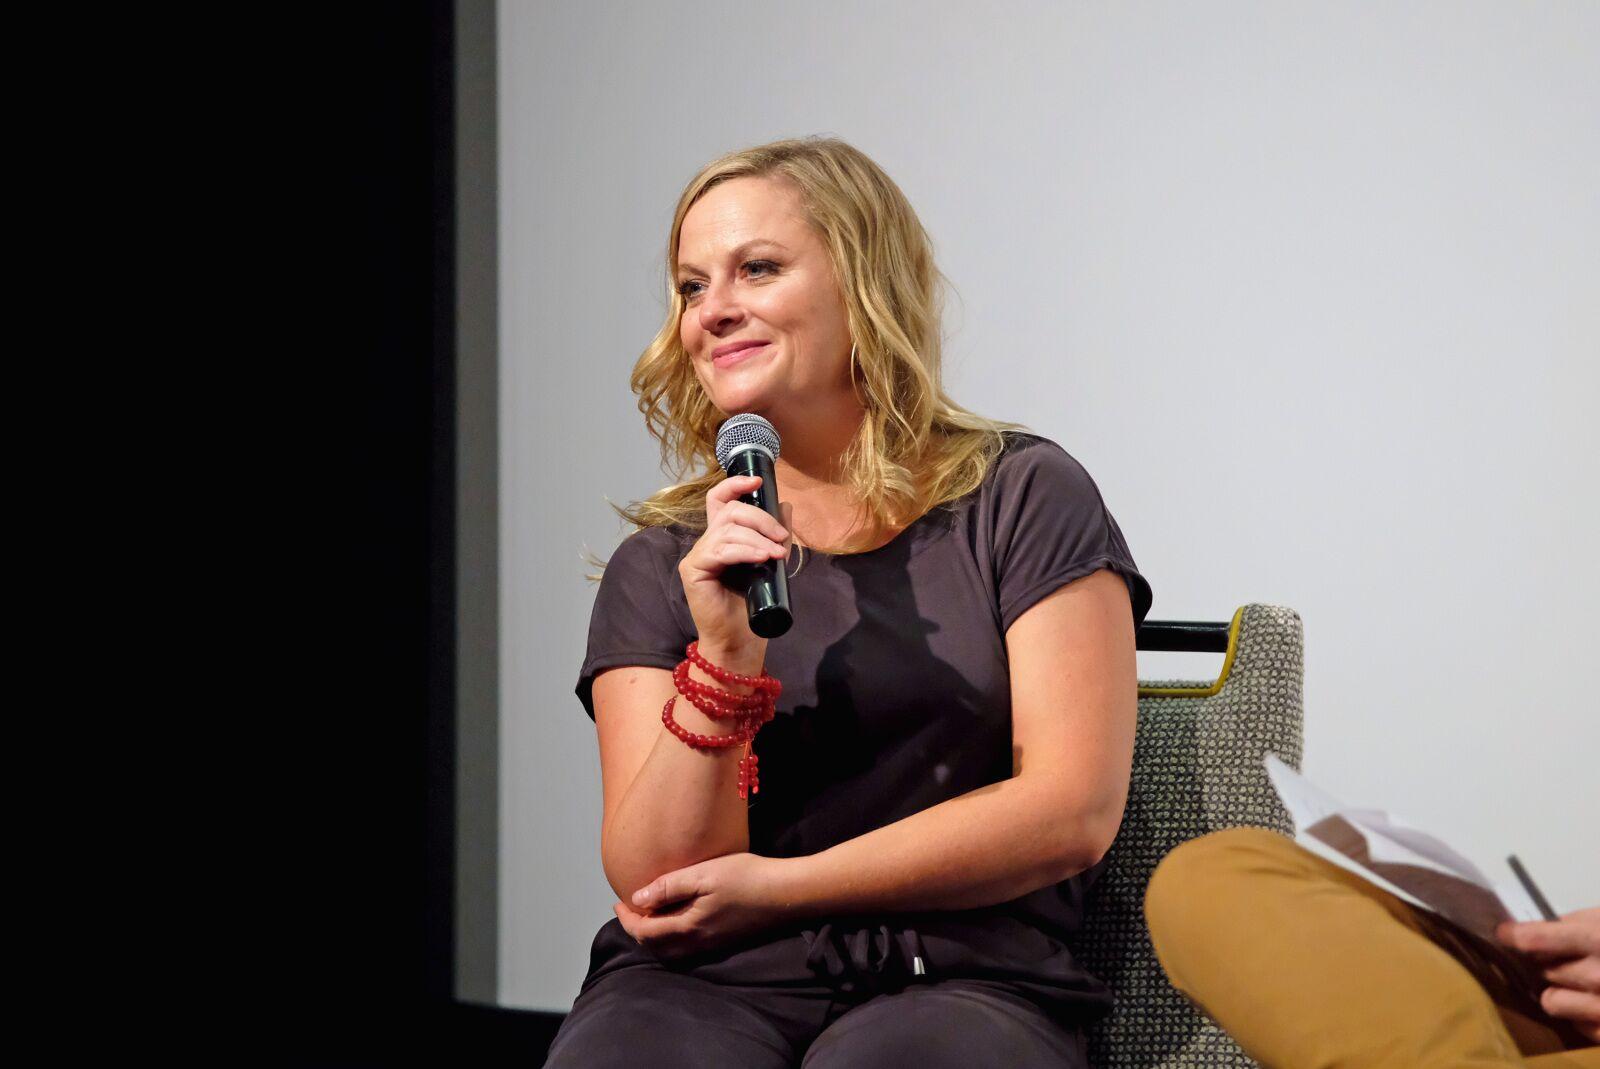 Amy Poehler to direct film adaptation of Moxie for Netflix